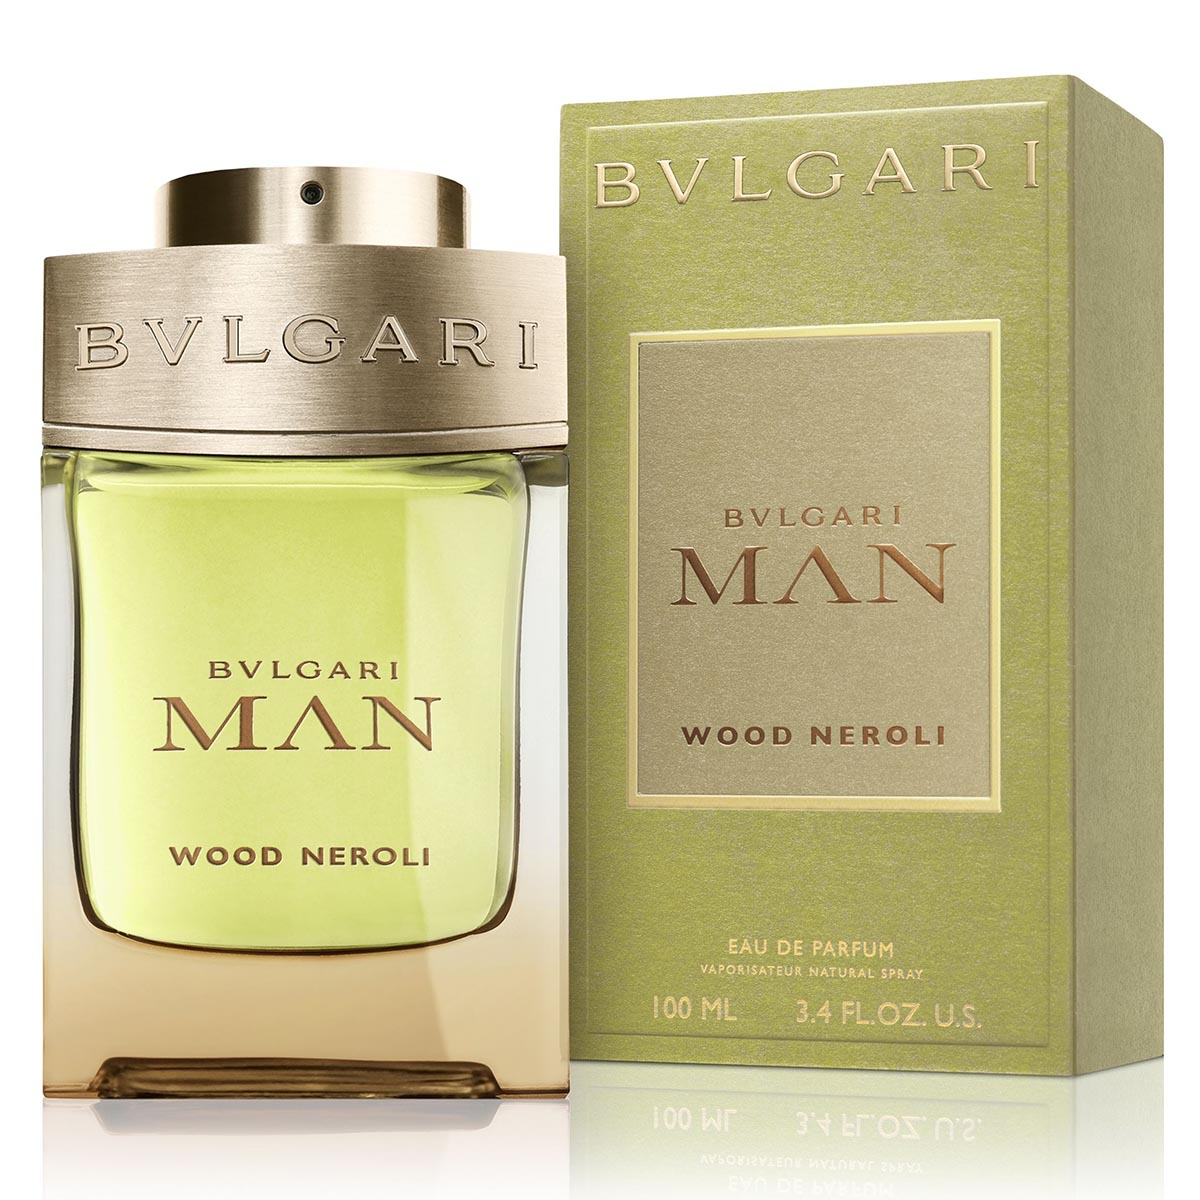 Bvlgari man wood neroli eau de parfum 100ml vaporizador